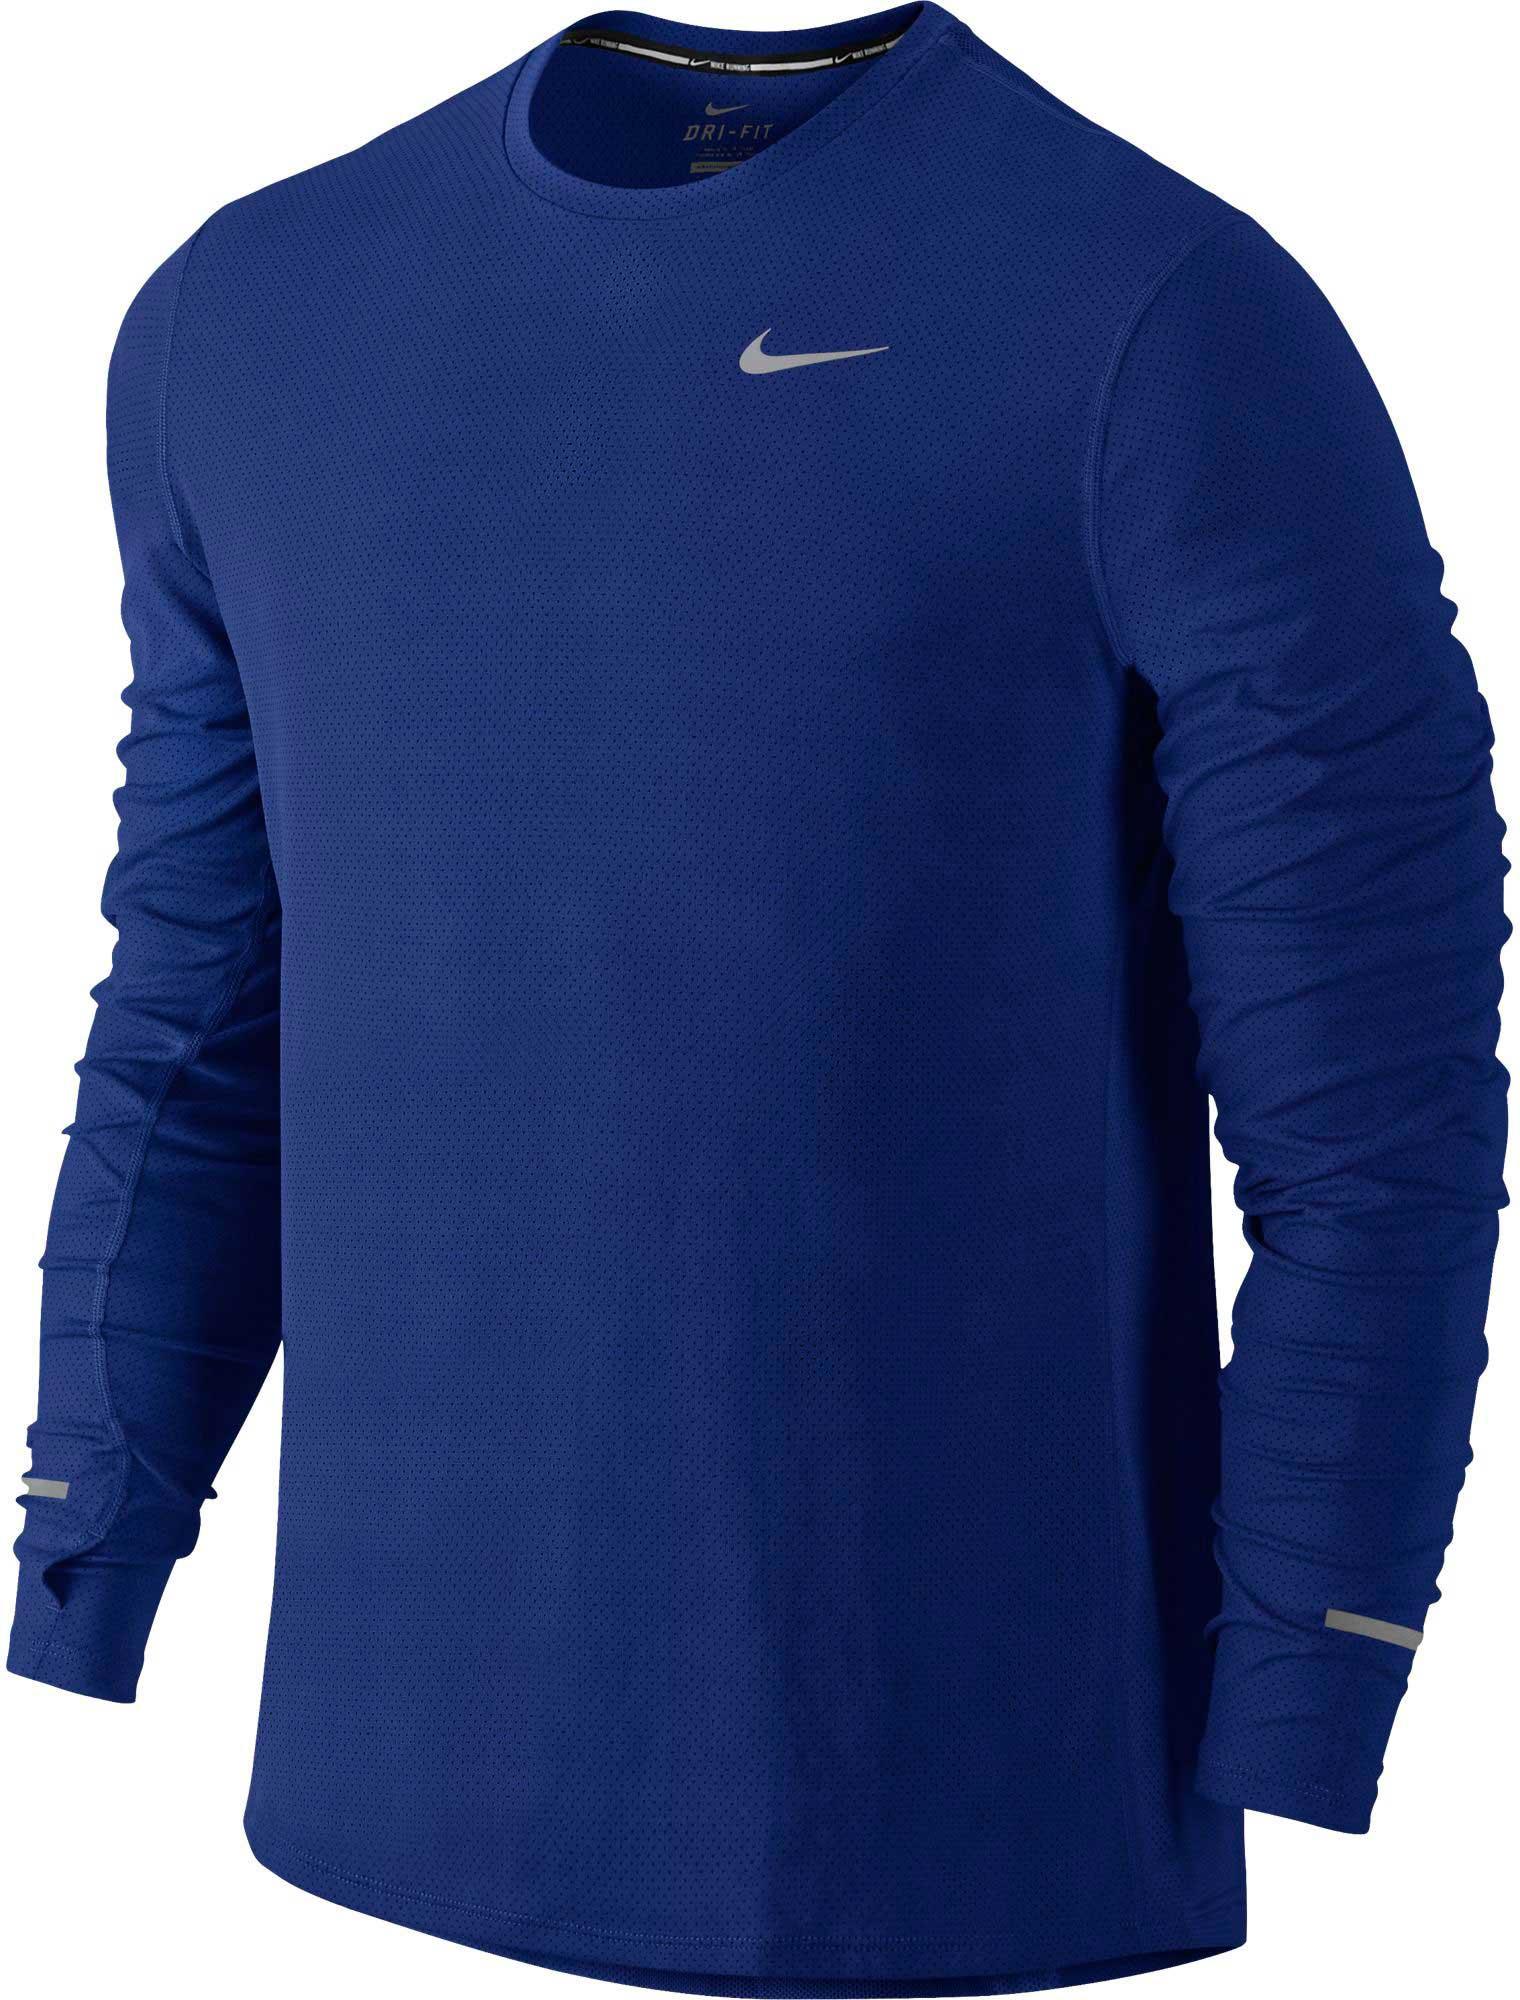 4f1d705fbe33 Nike CONTOUR LS